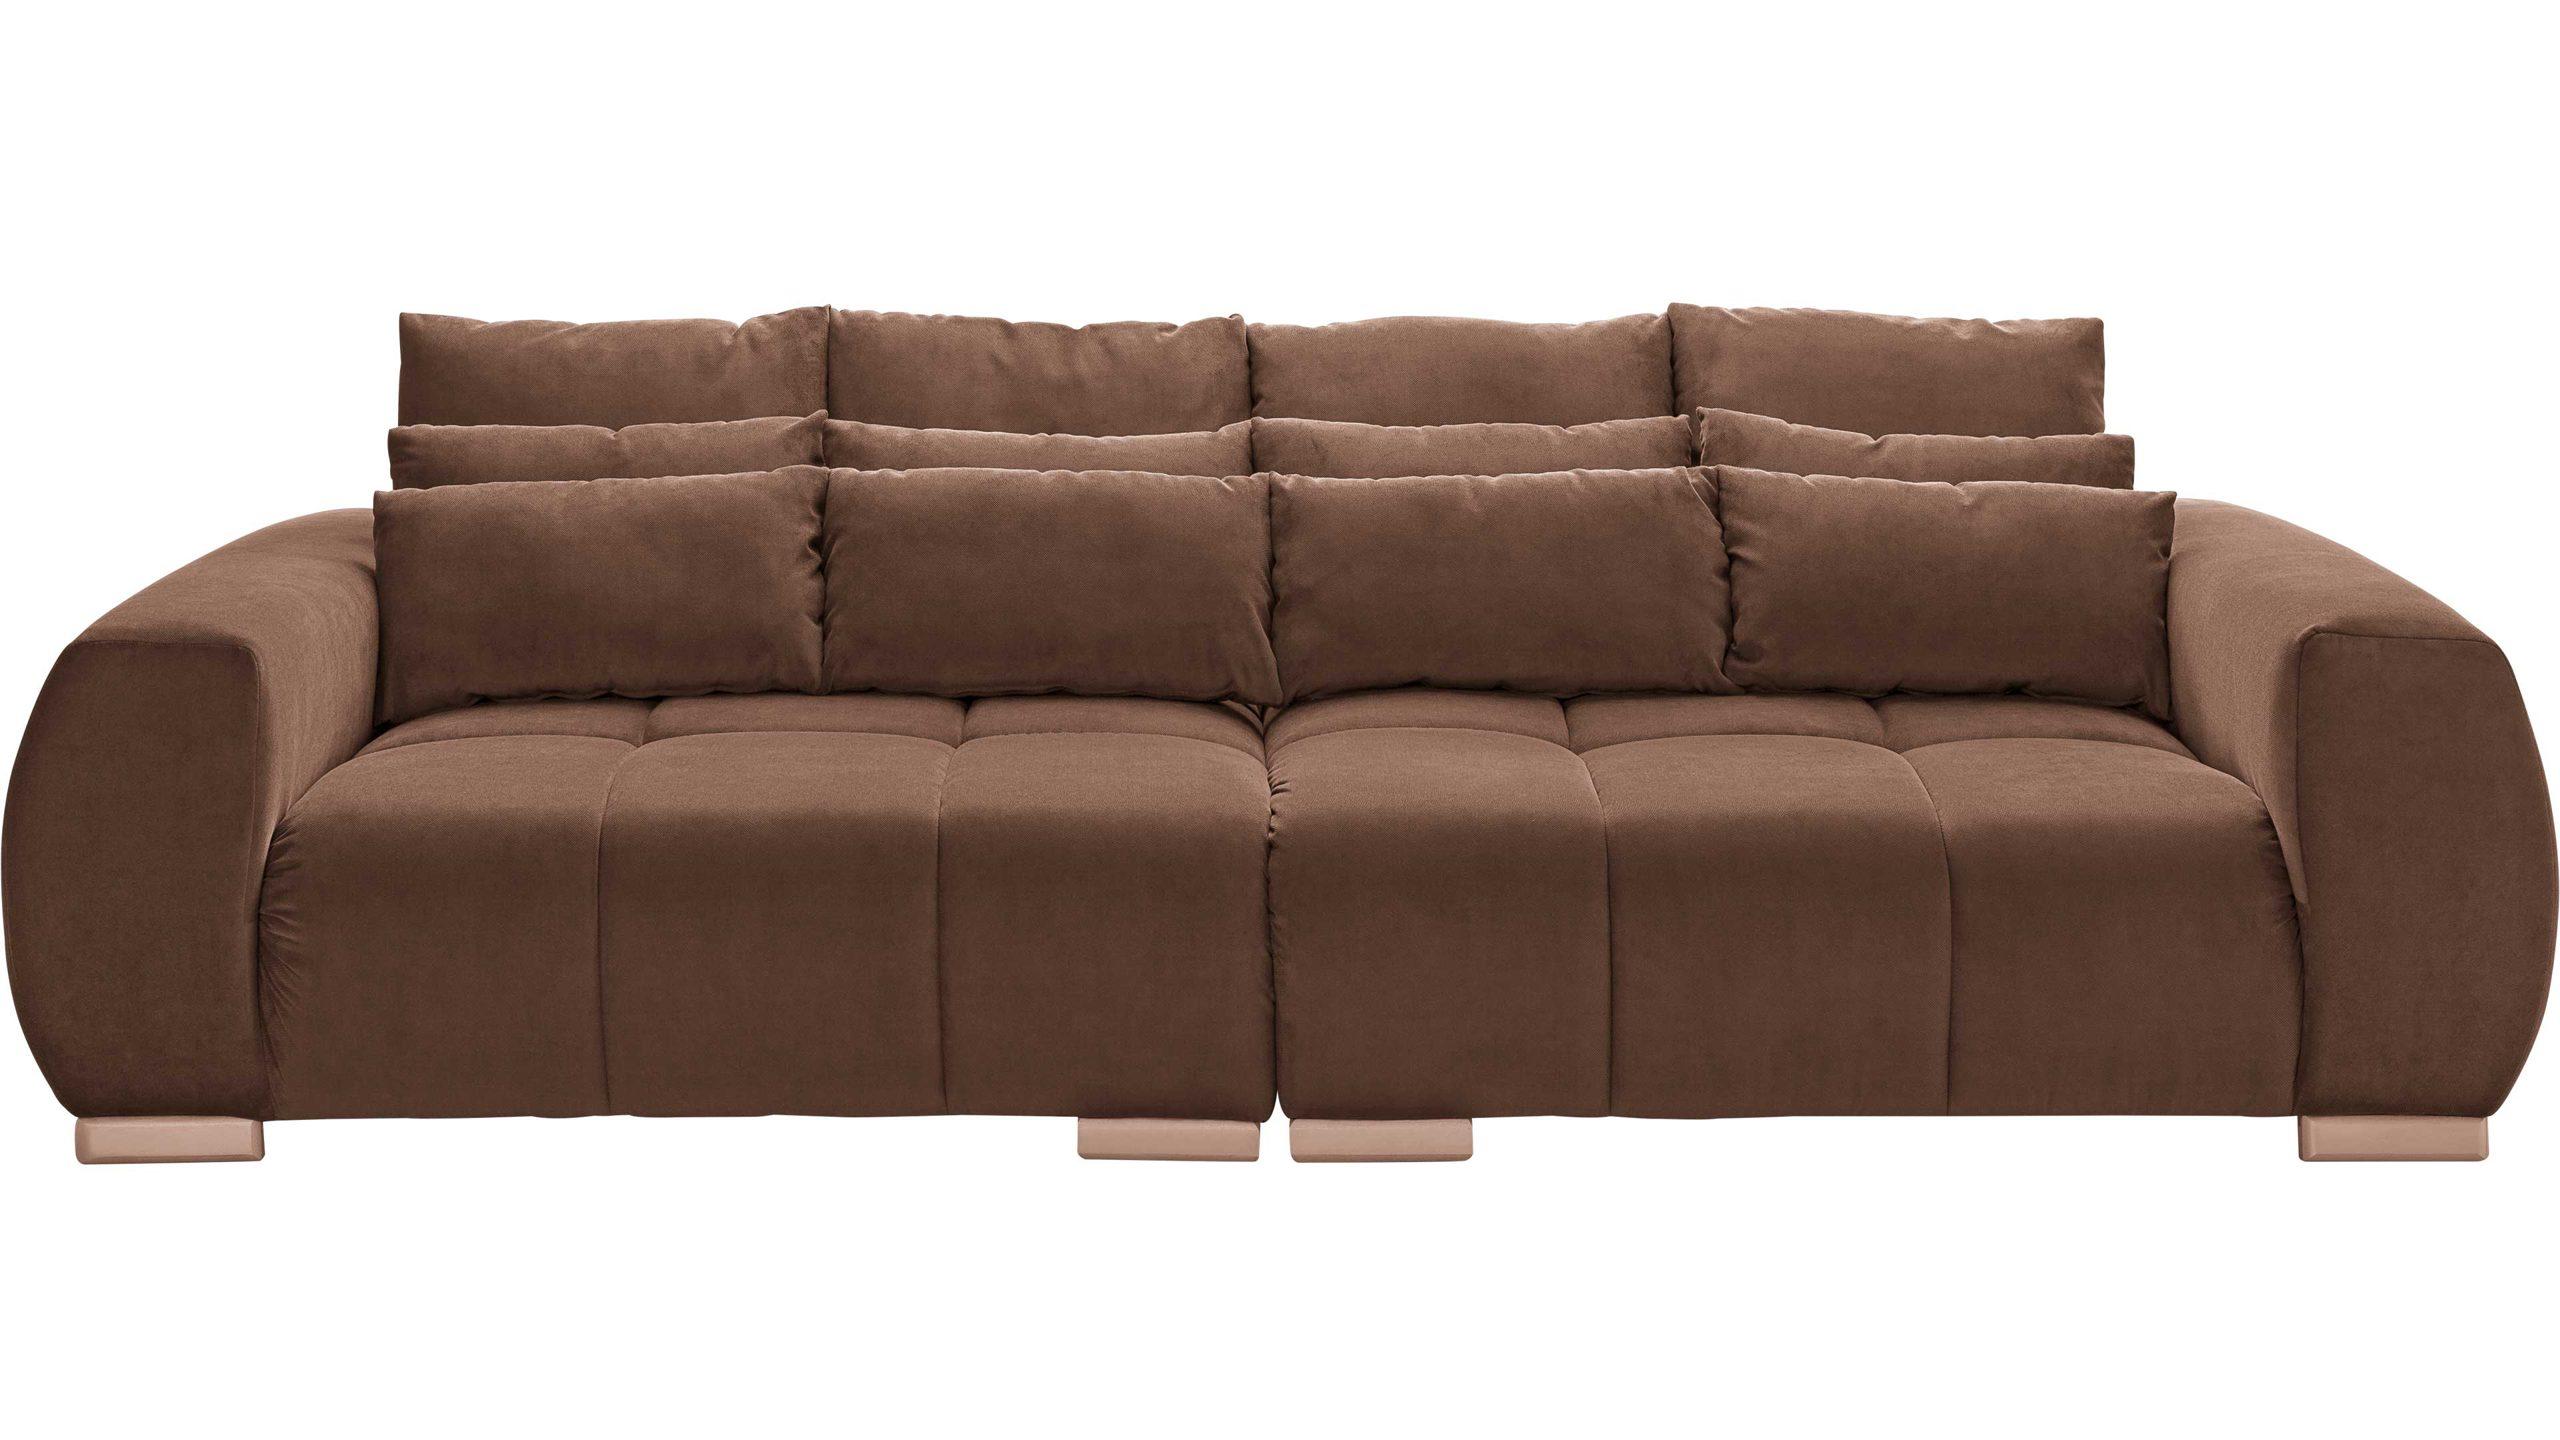 KAWOO Bigsofa Escape bzw. Couch